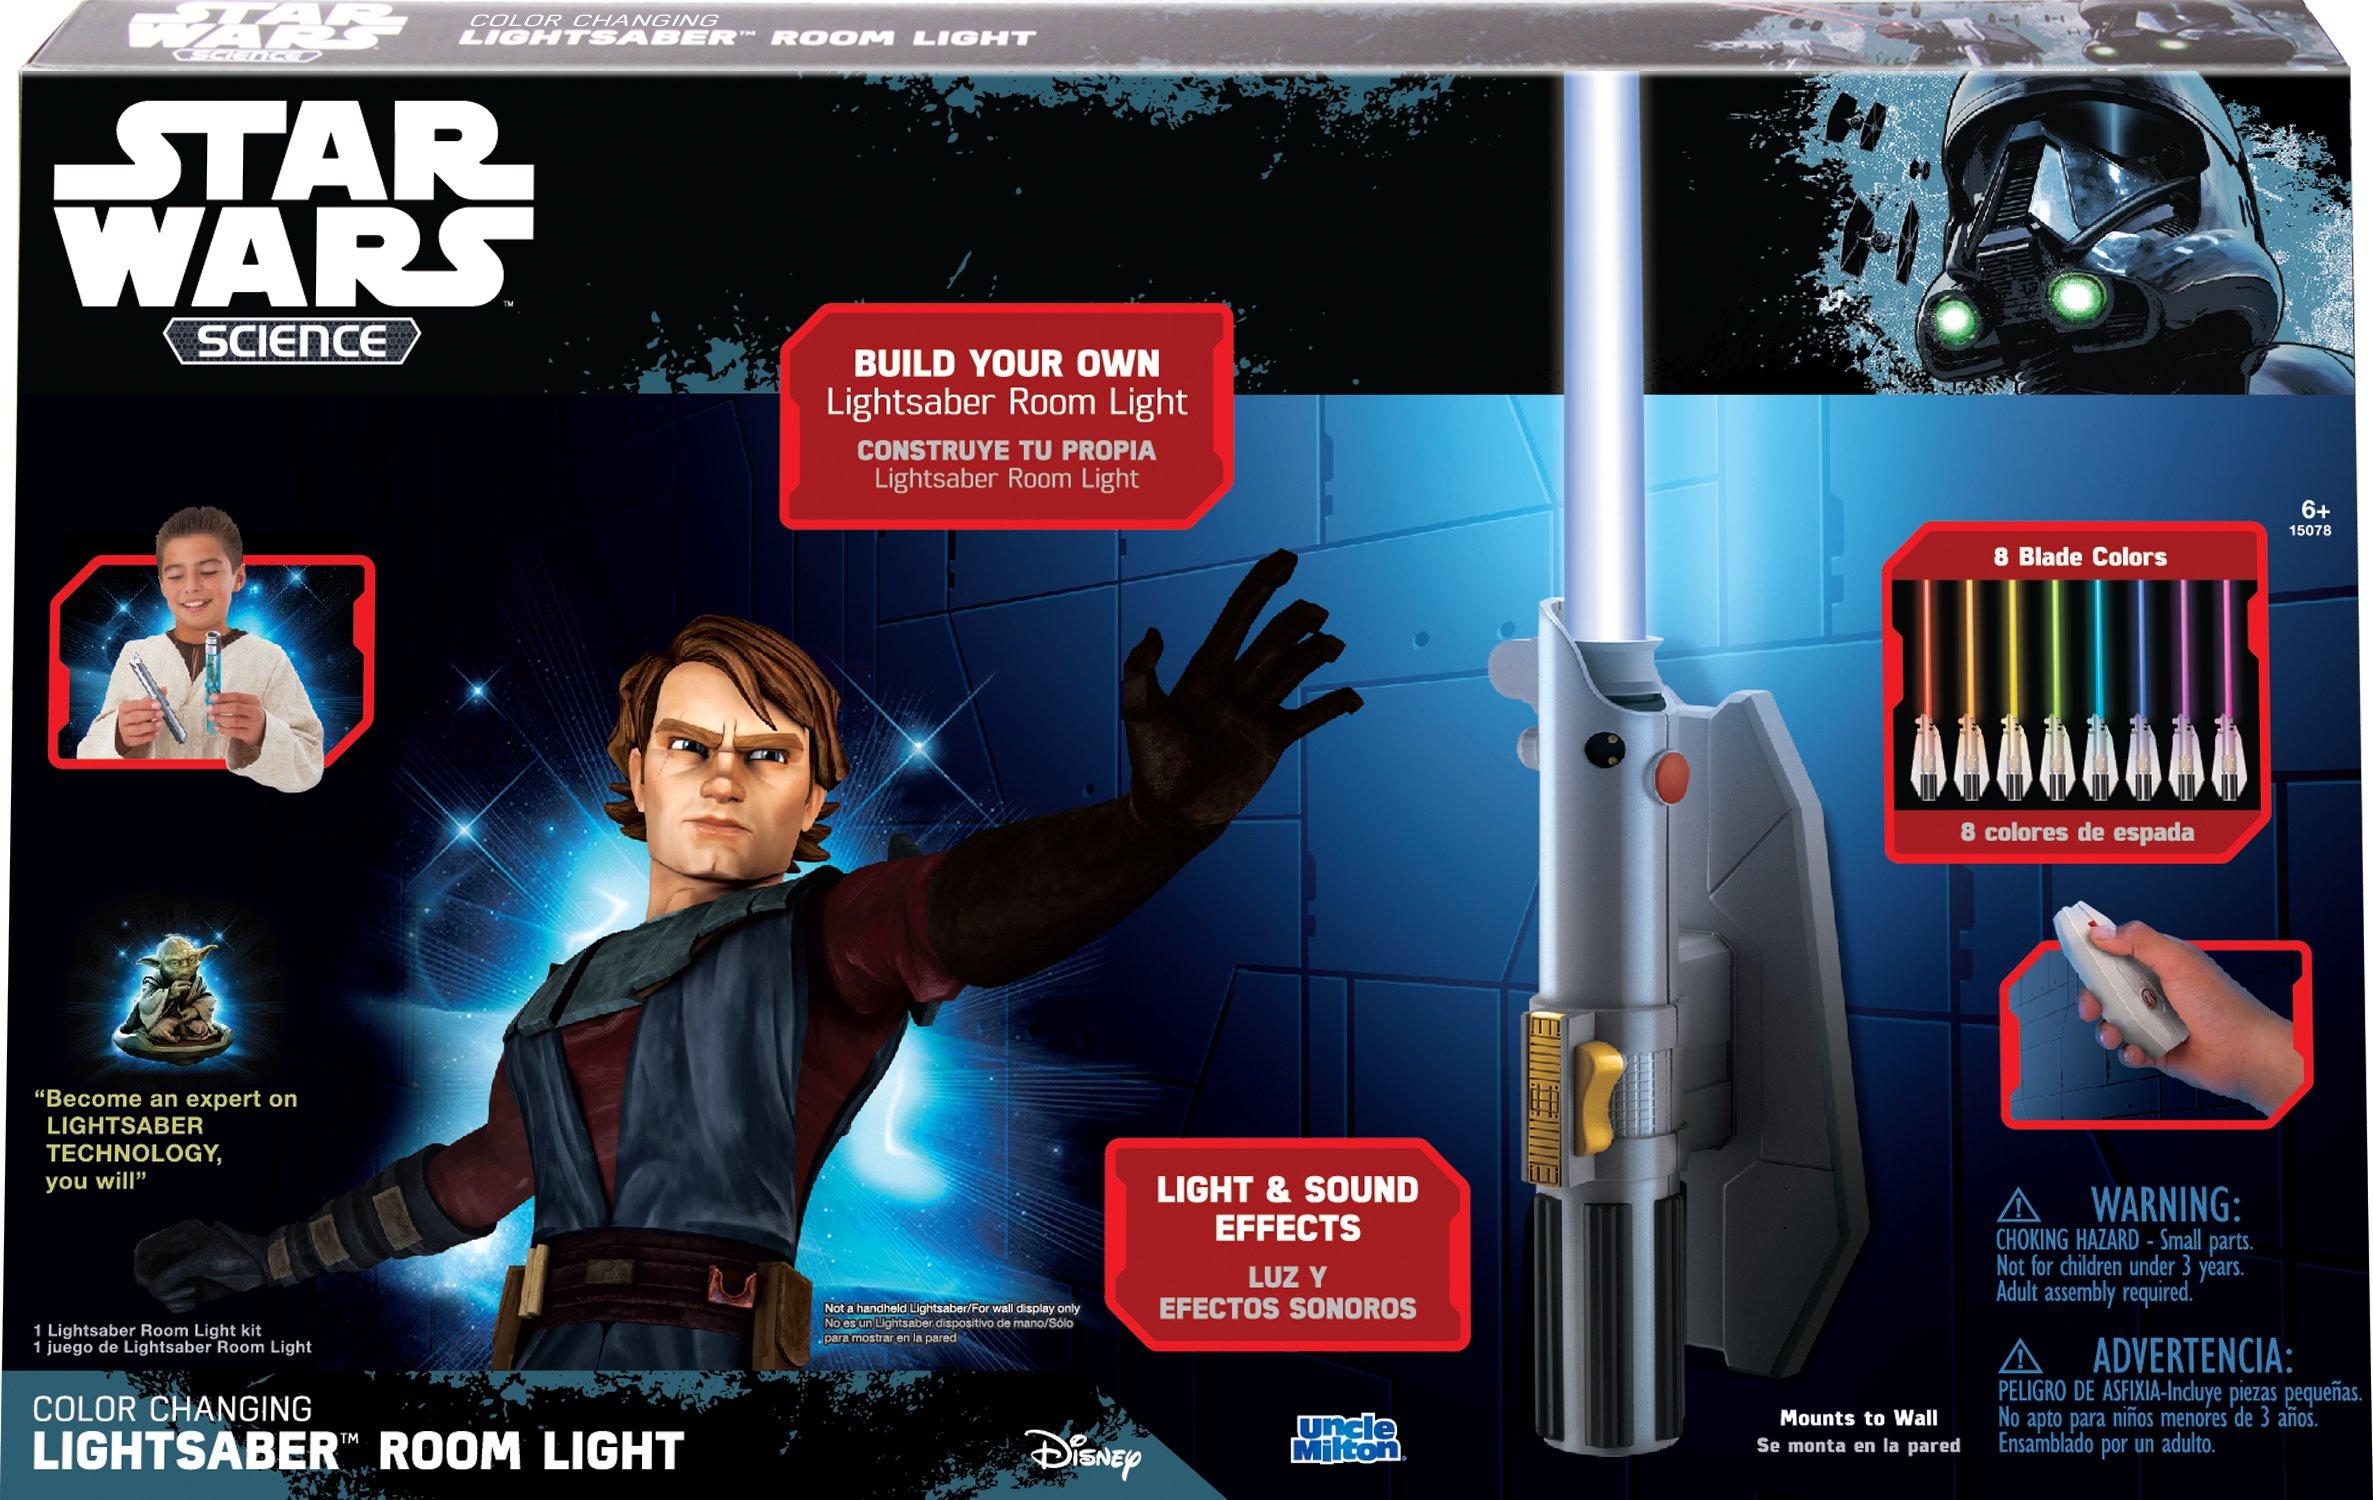 Star Wars Science Multicolor Lightsaber Room Light - Uncle Milton